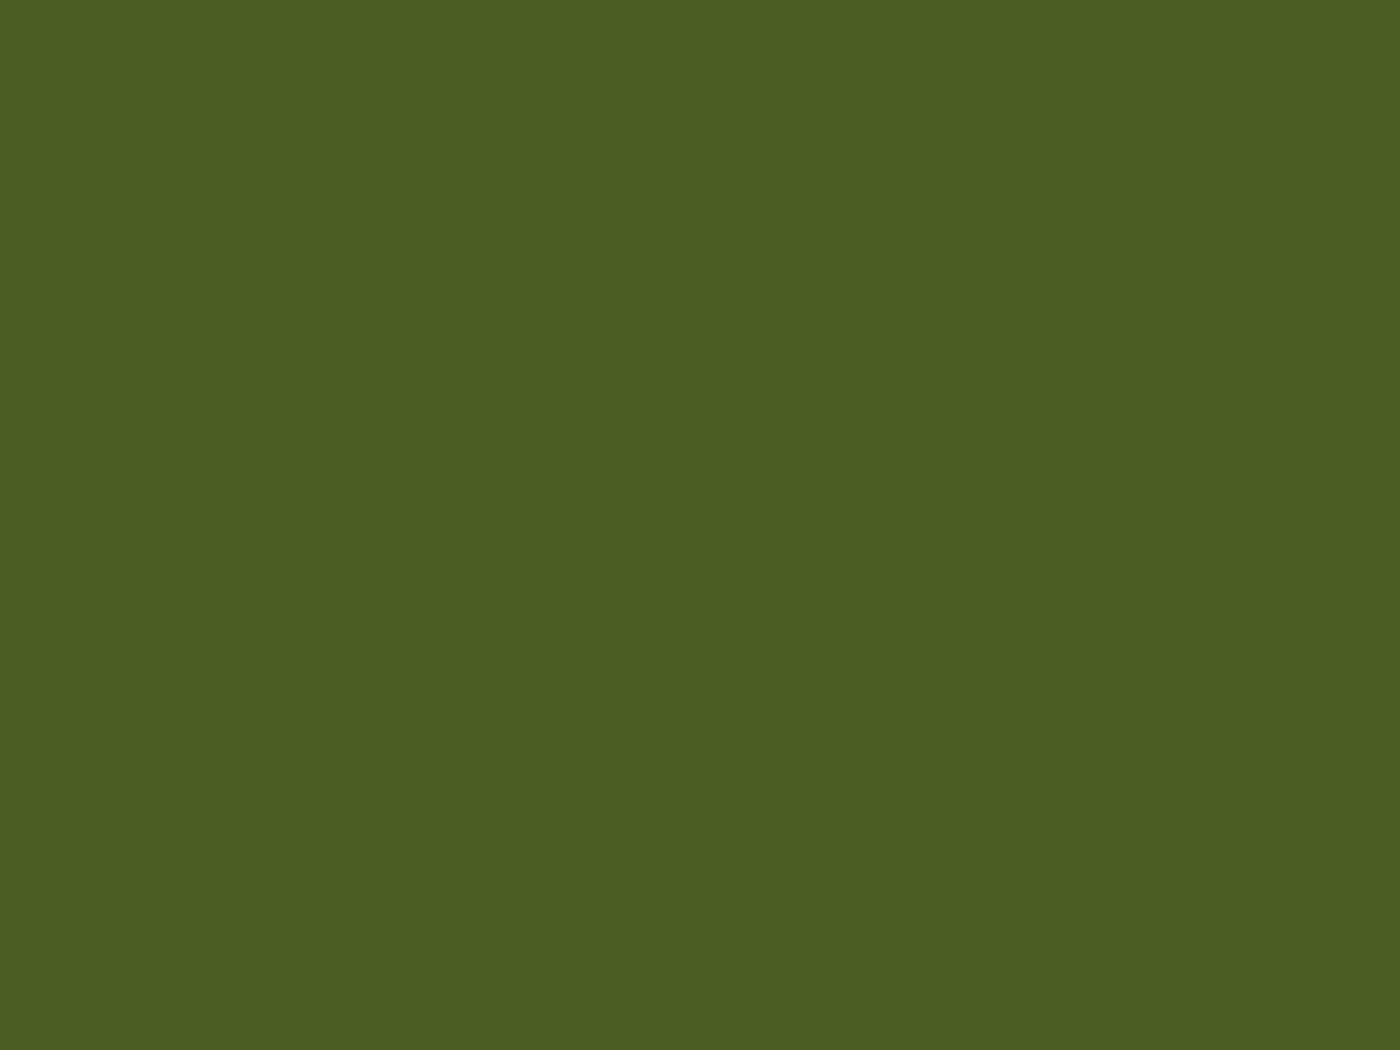 resolution dark moss green - photo #3